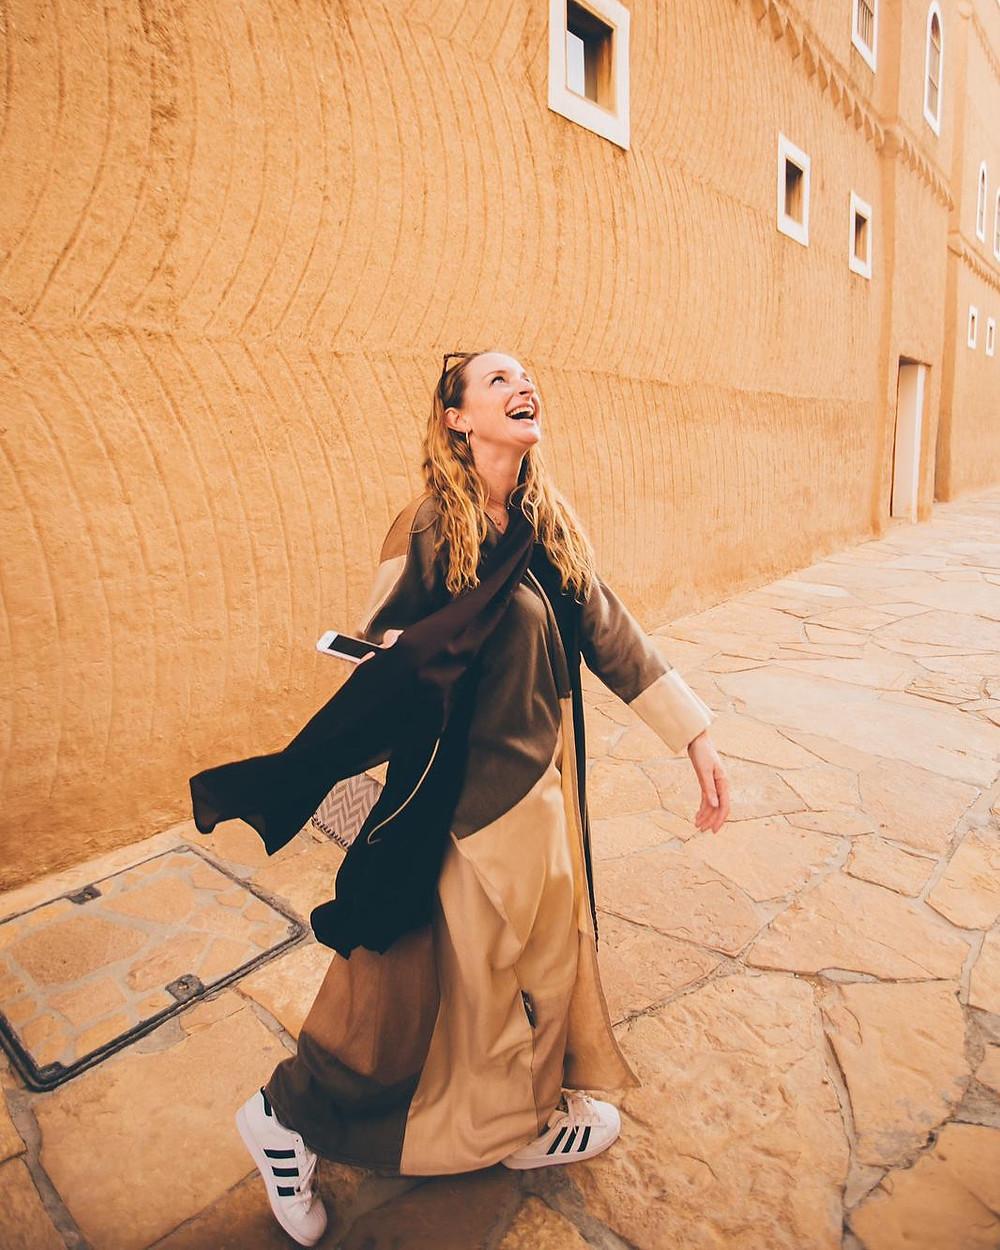 Nicola Chilton in Riyadh, Saudi Arabia